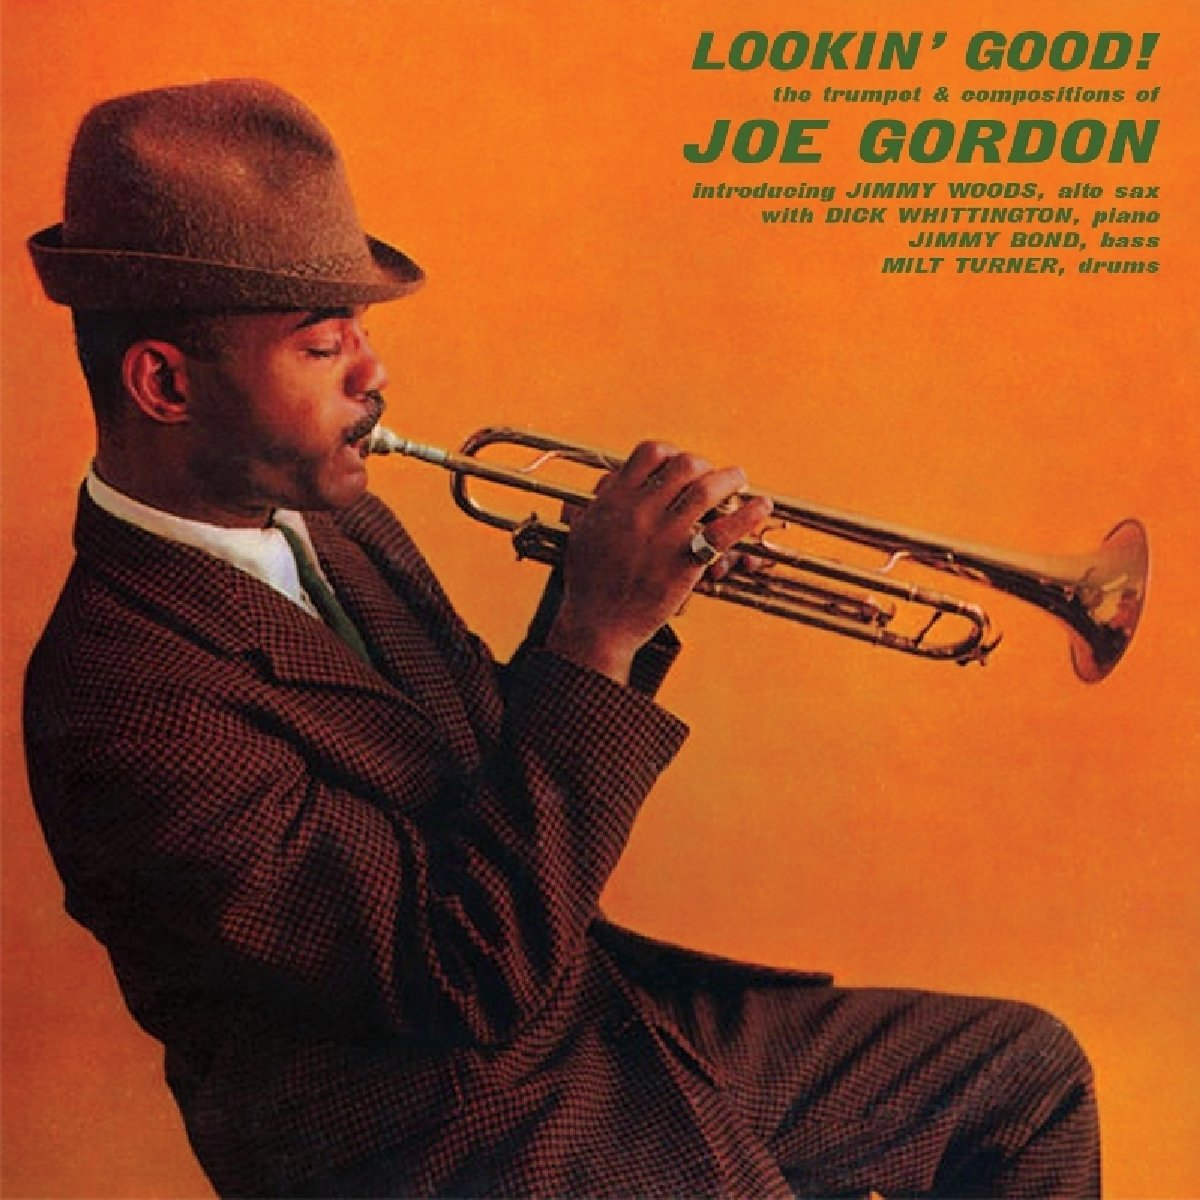 CD : Joe Gordon - Lookin Good! (United Kingdom - Import)